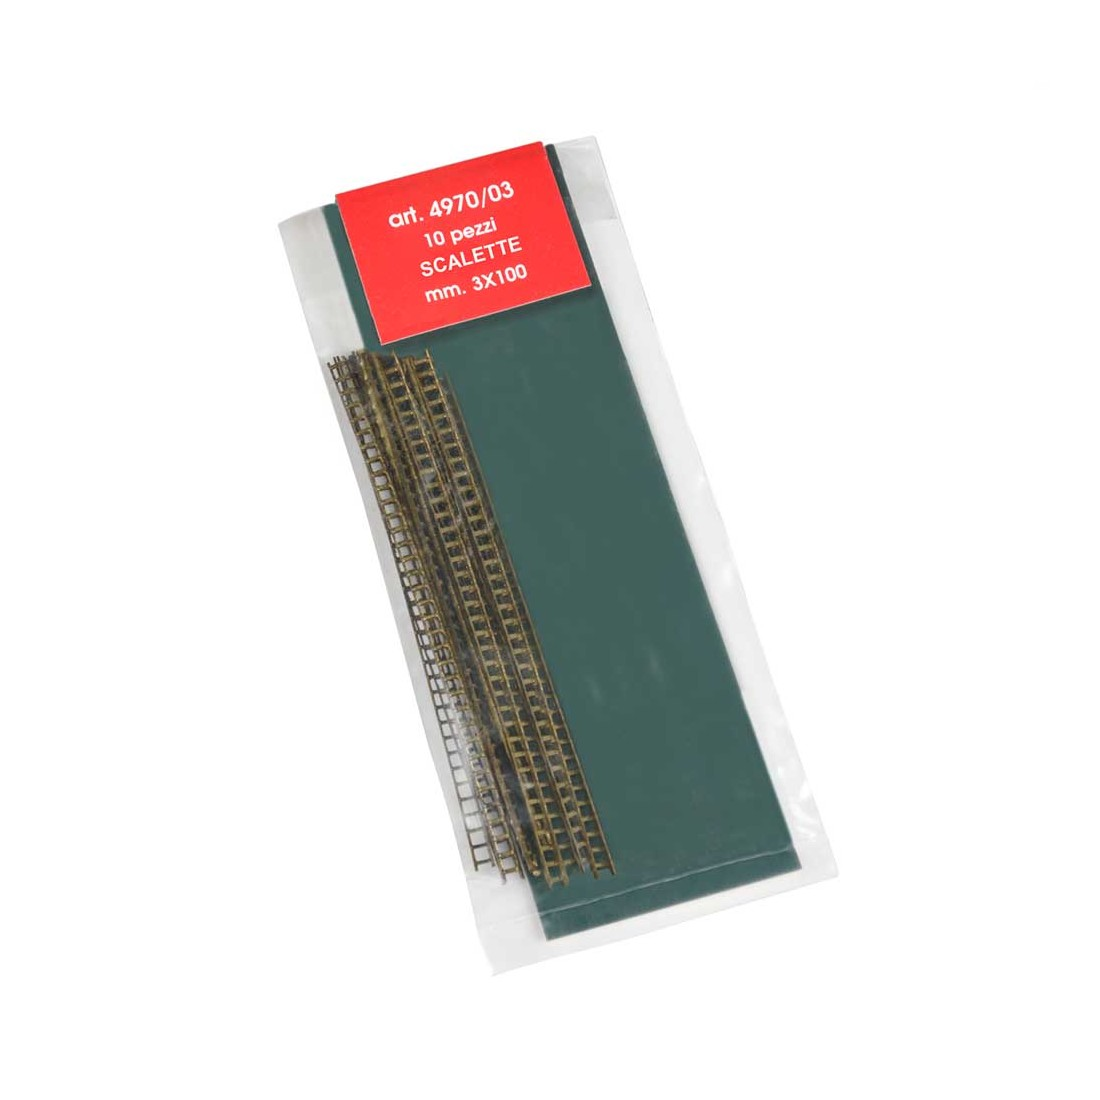 Echelles métal 3x100 mm.